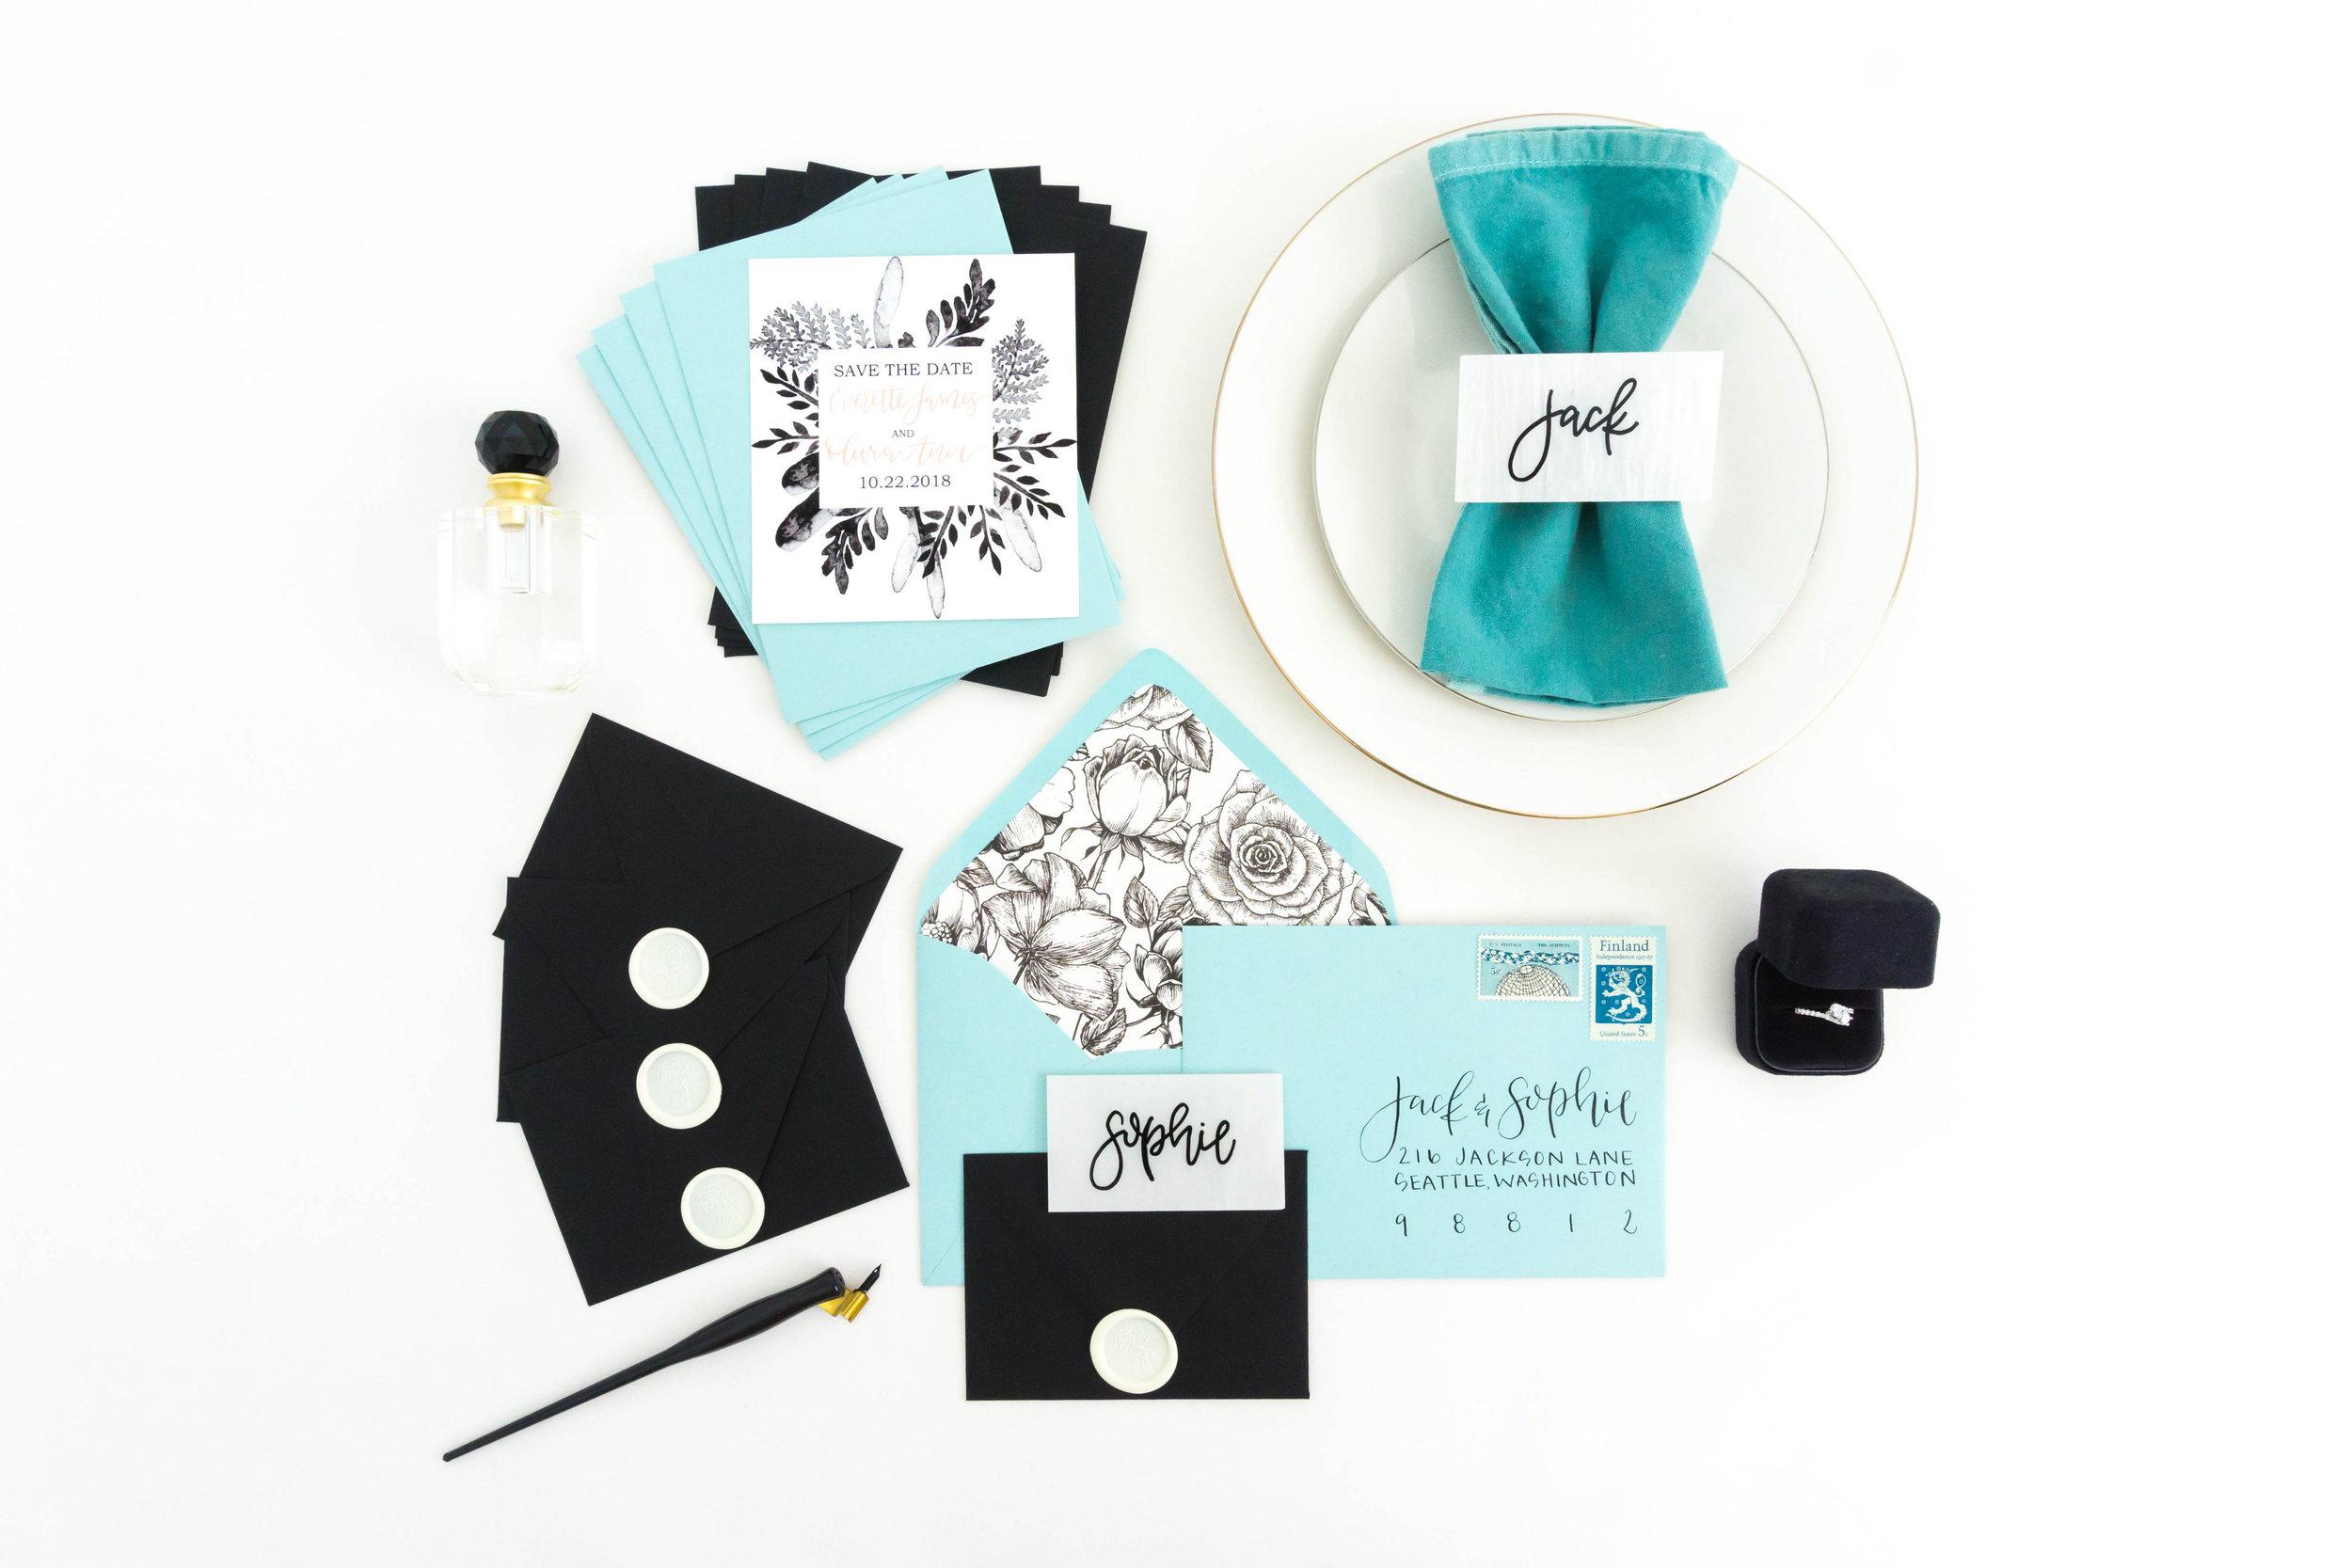 love-fern-design-studio-custom-wedding-invitations-for-the-modern-couple-modern-calligraphy-in-seattle-washington-custom-wedding-stationery-black-watercolor-invitation-teal-envelopes-floral-liner